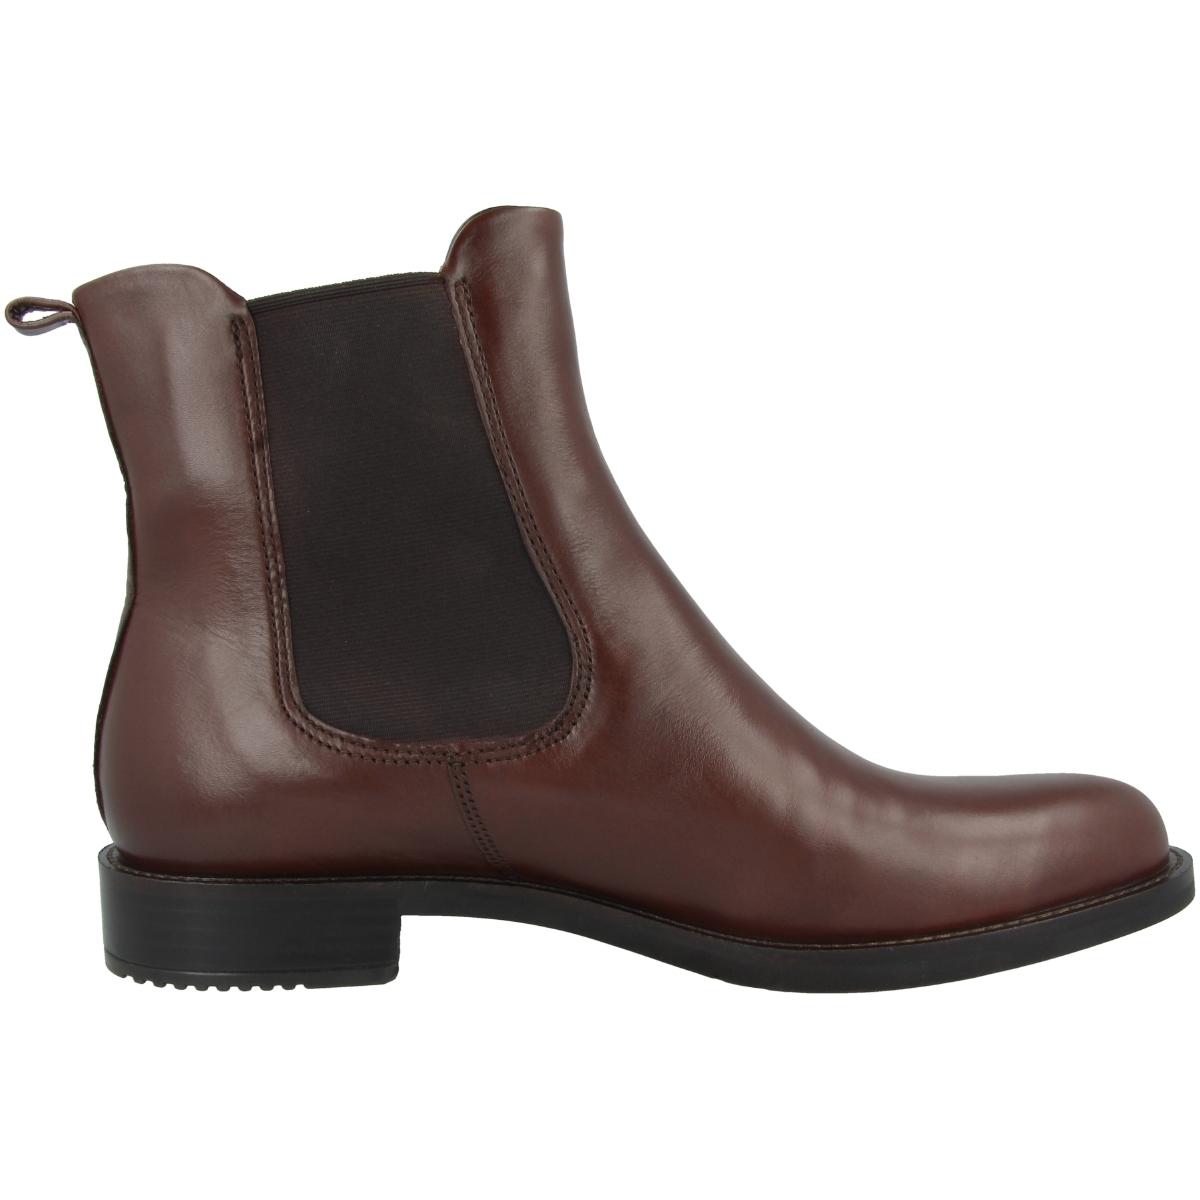 Details zu Ecco Sartorelle 25 Schuhe Women Damen Stiefeletten Chelsea Boots 266503 01014